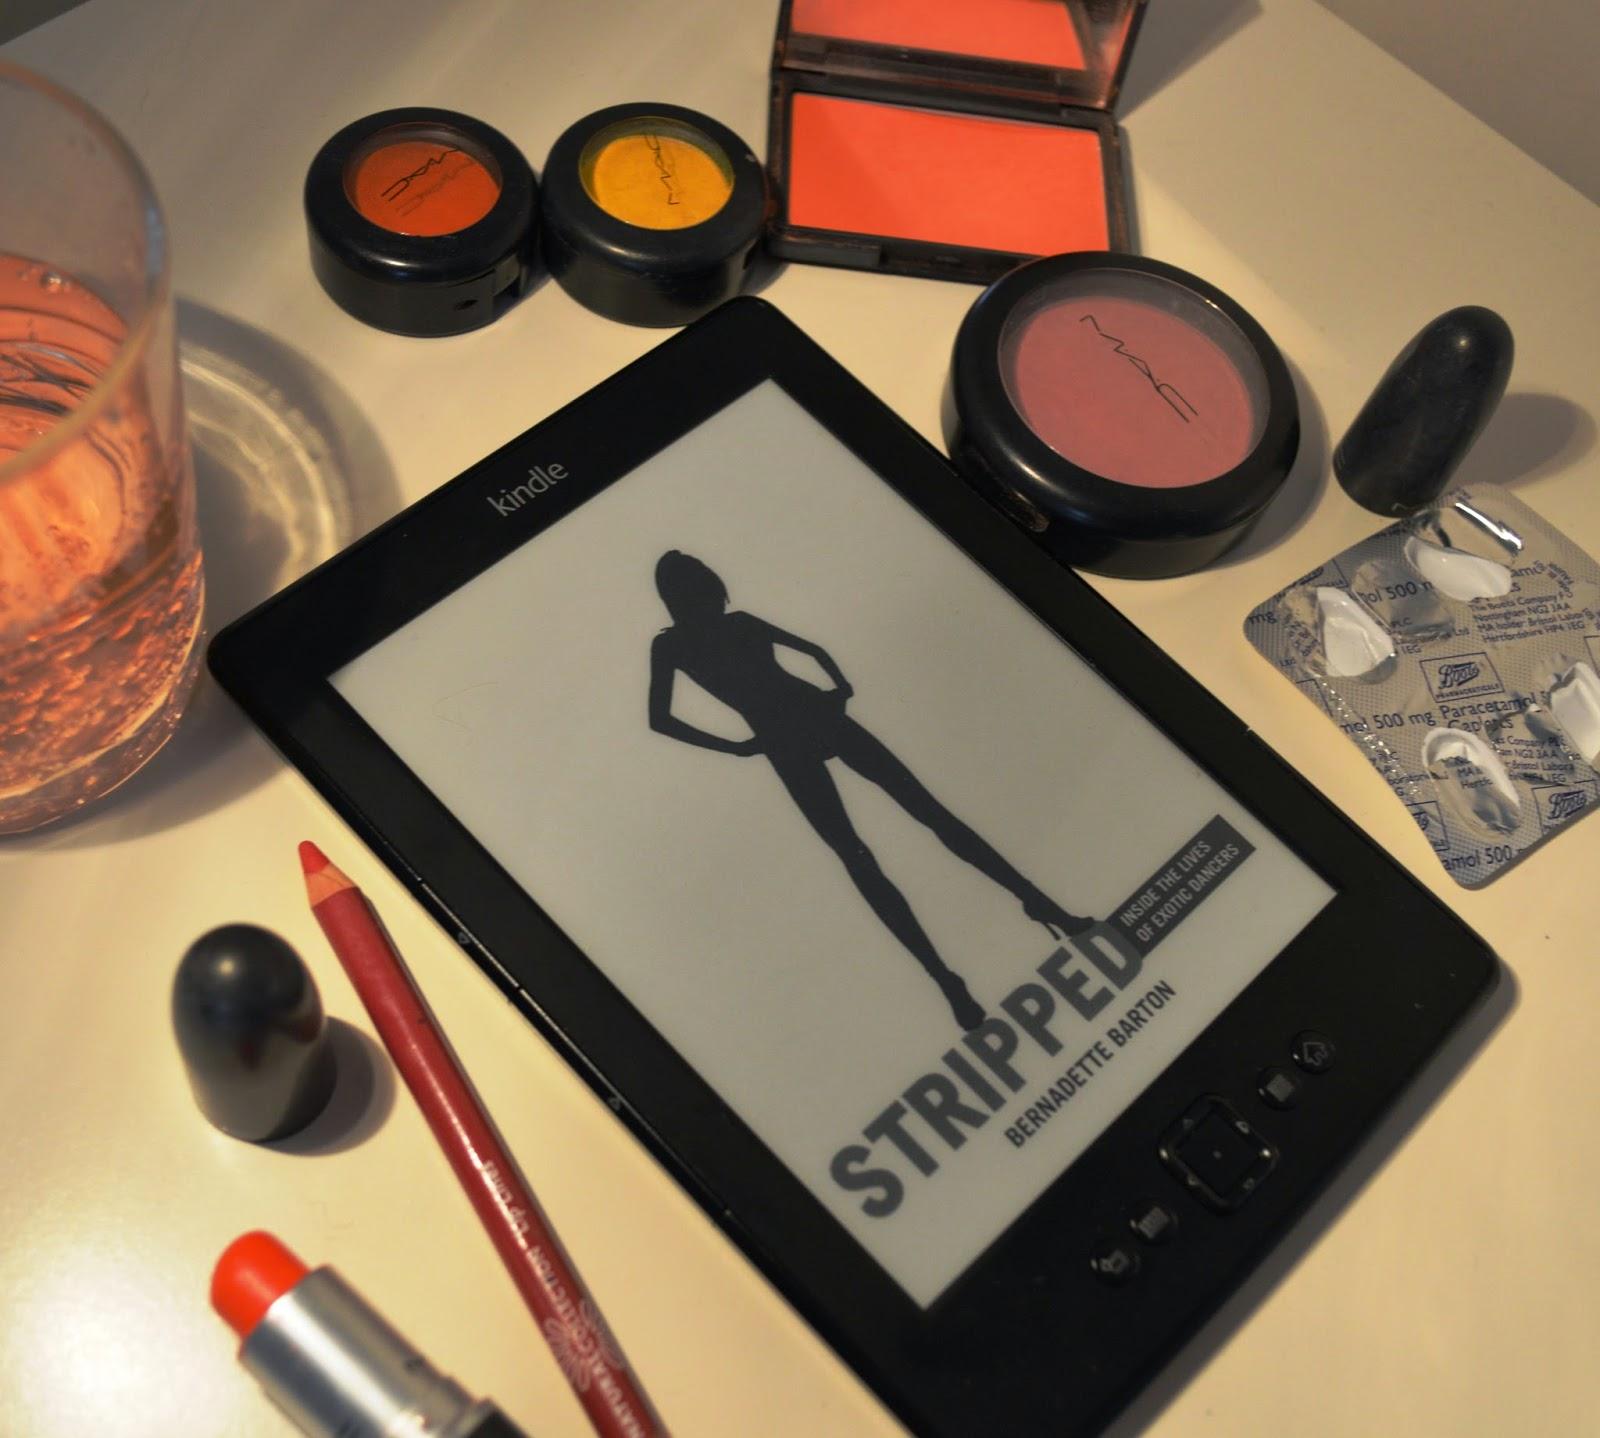 Stripped, exotic dancers, experience, life story, Bernadette Barton, review, book, American, exotic dancers, sex workers, memoir, sex industry